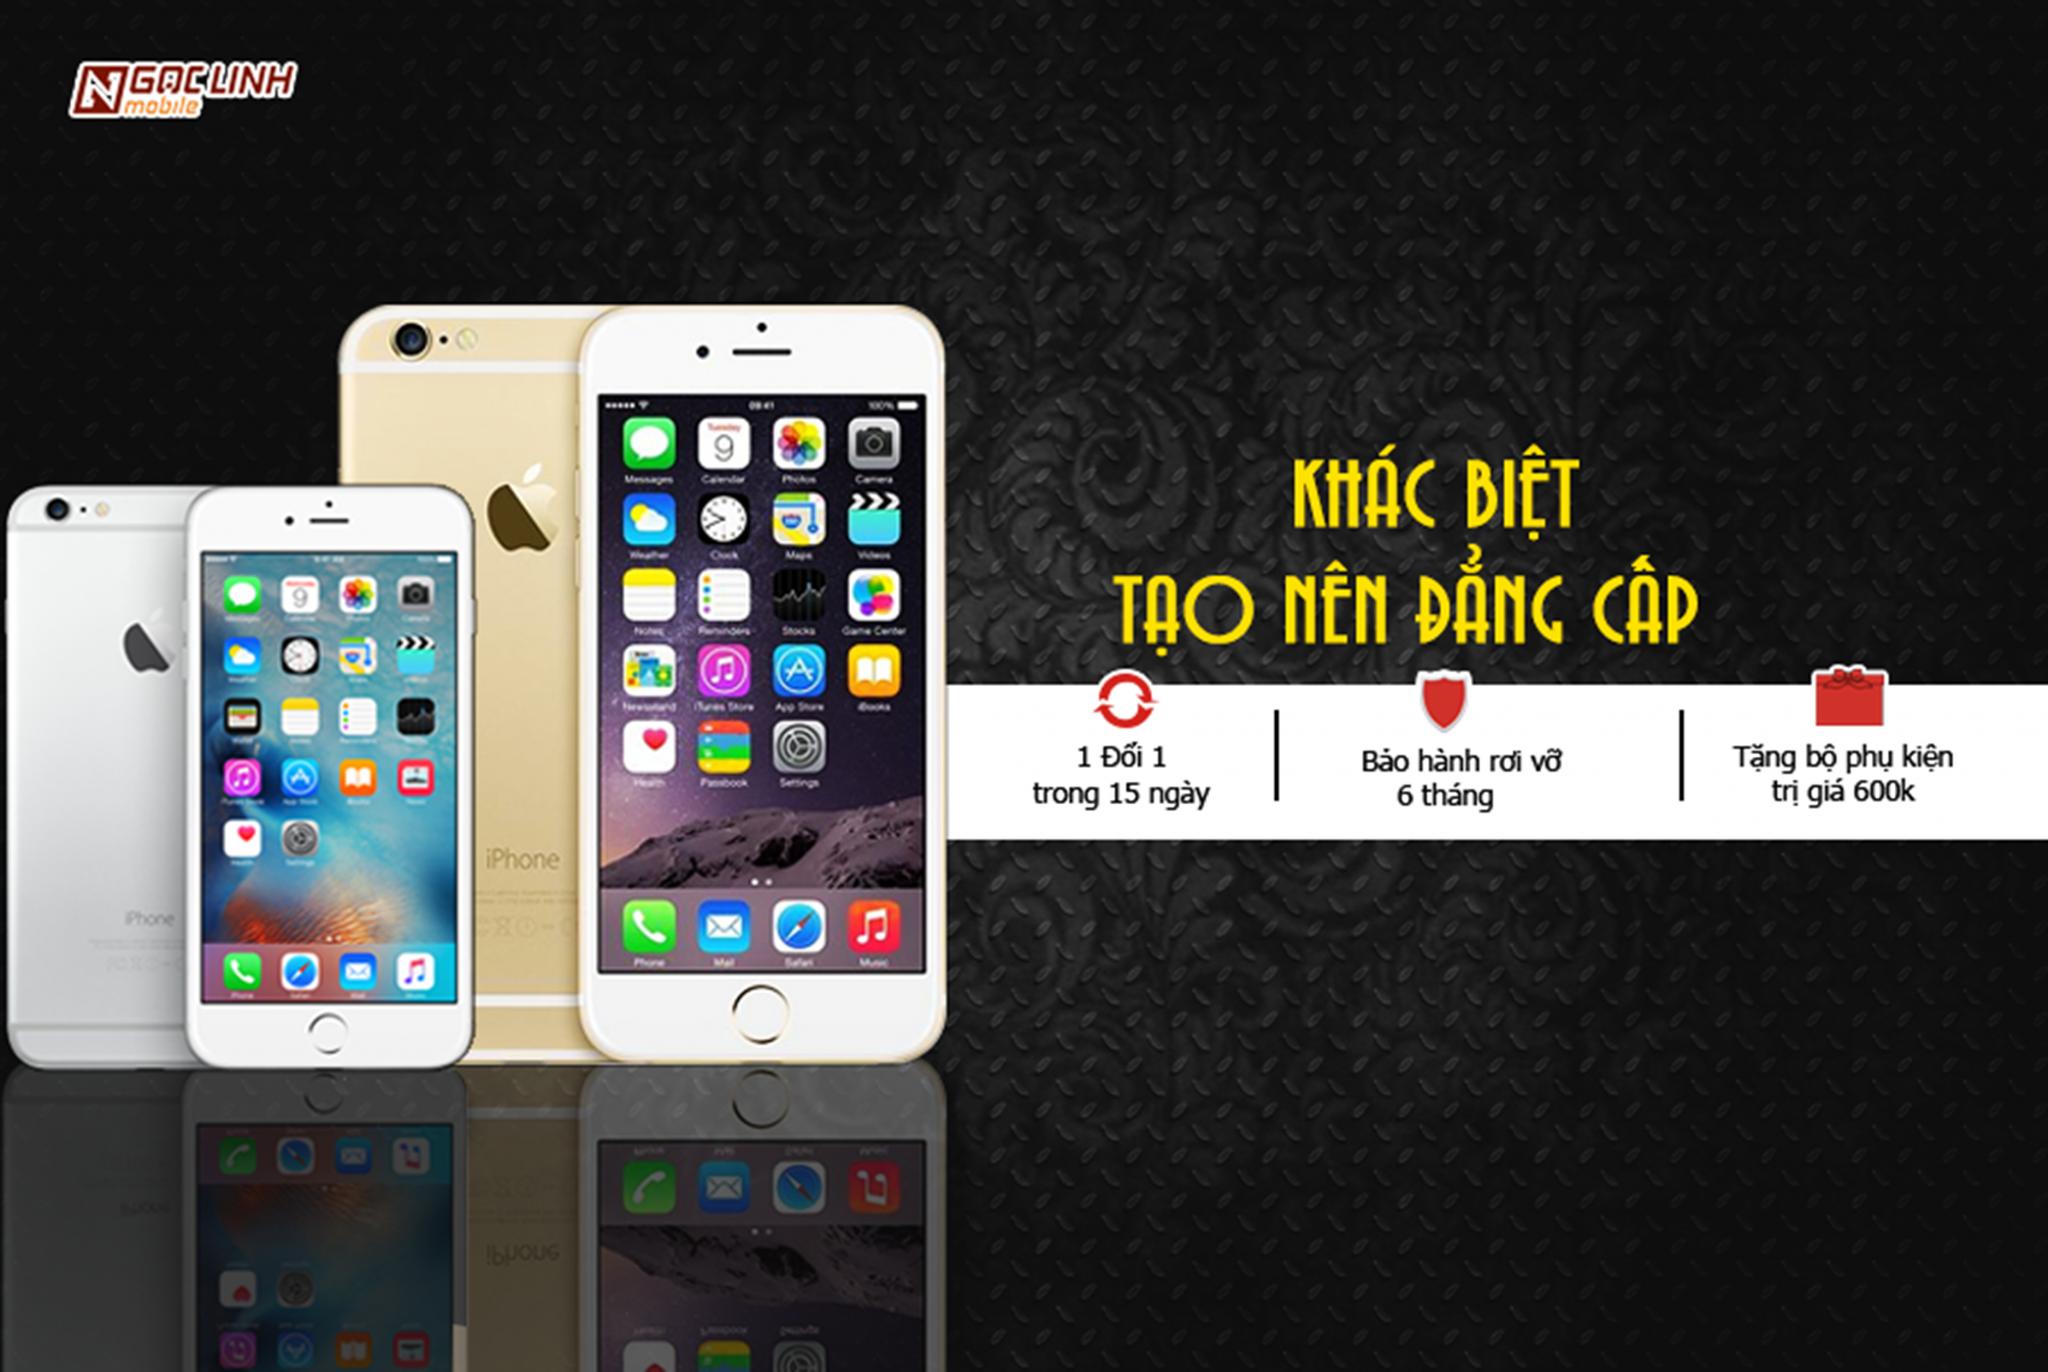 bảo hành rơi vỡ  bảo hành rơi vỡ - Bảo Hành Rơi Vỡ Dành Cho Iphone Tại Ngọc Linh Mobile